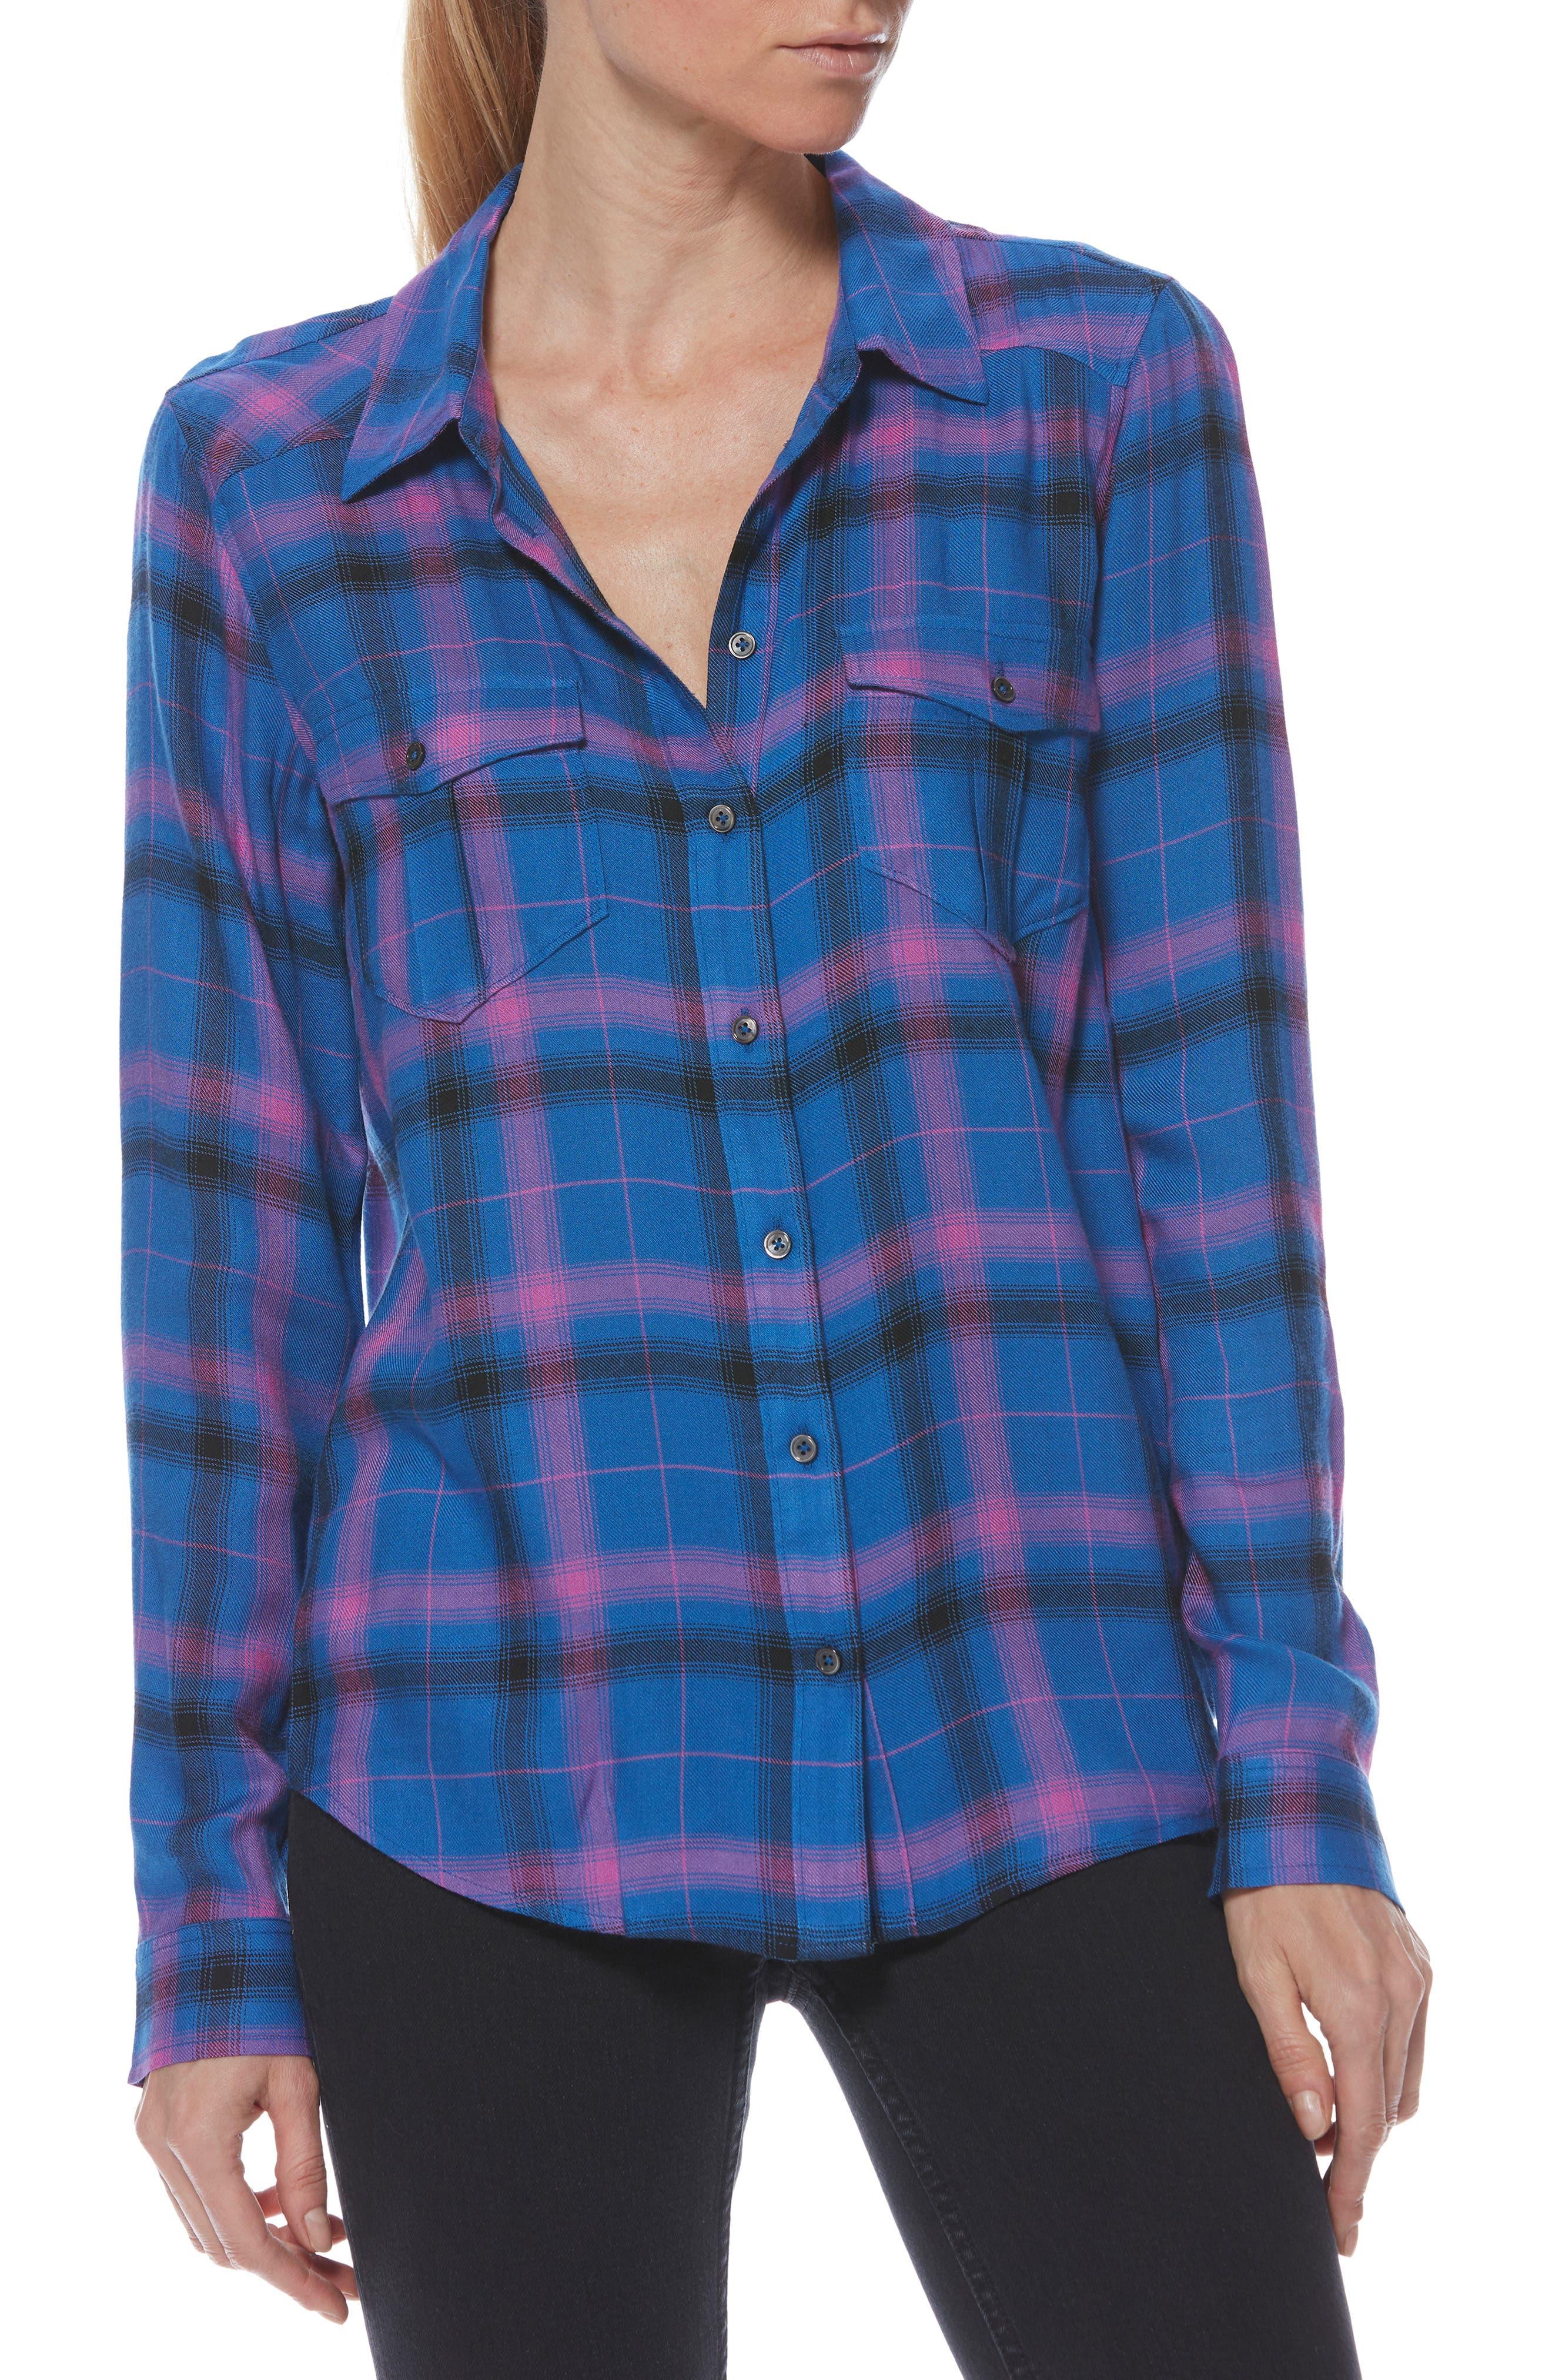 Mya Plaid Shirt,                             Main thumbnail 1, color,                             BRIGHT CROWN BLUE MULTI